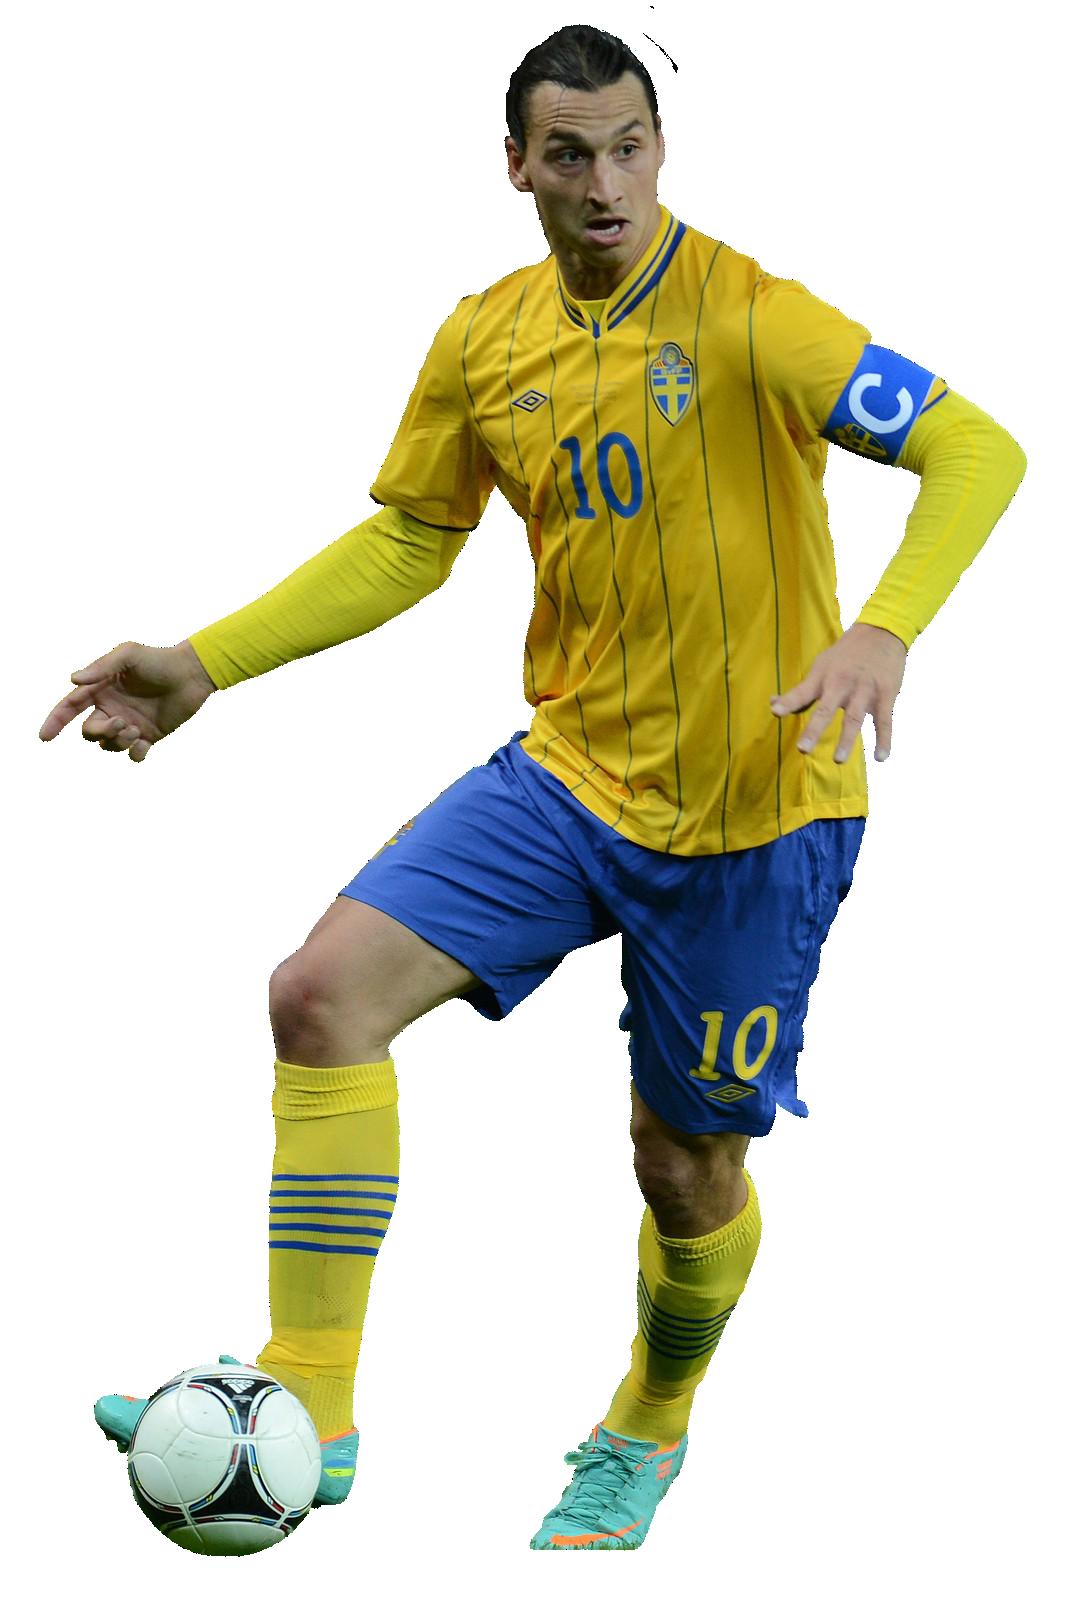 Yellow Zlatan Ibrahimovic Png image #41053